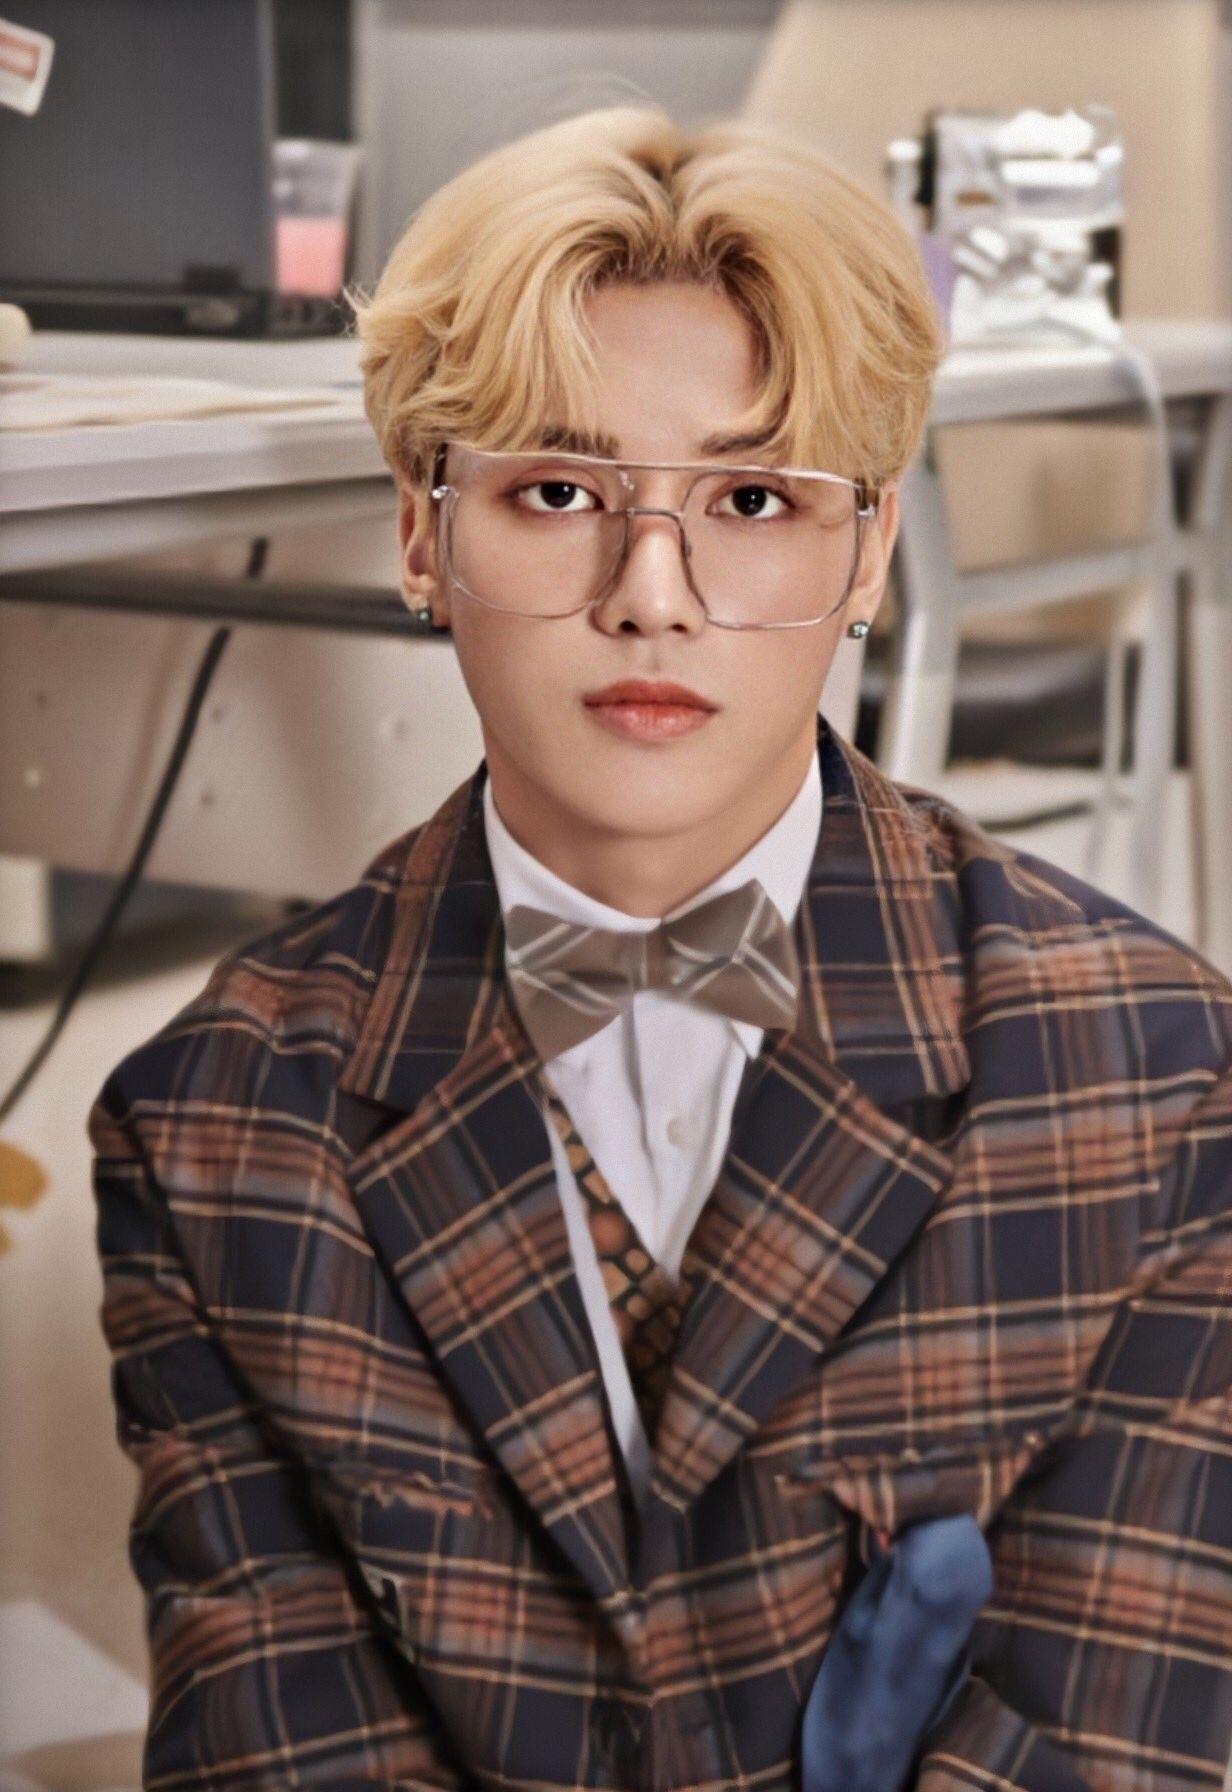 Wooyoung Woo Young Jung Woo Young Jung Woo